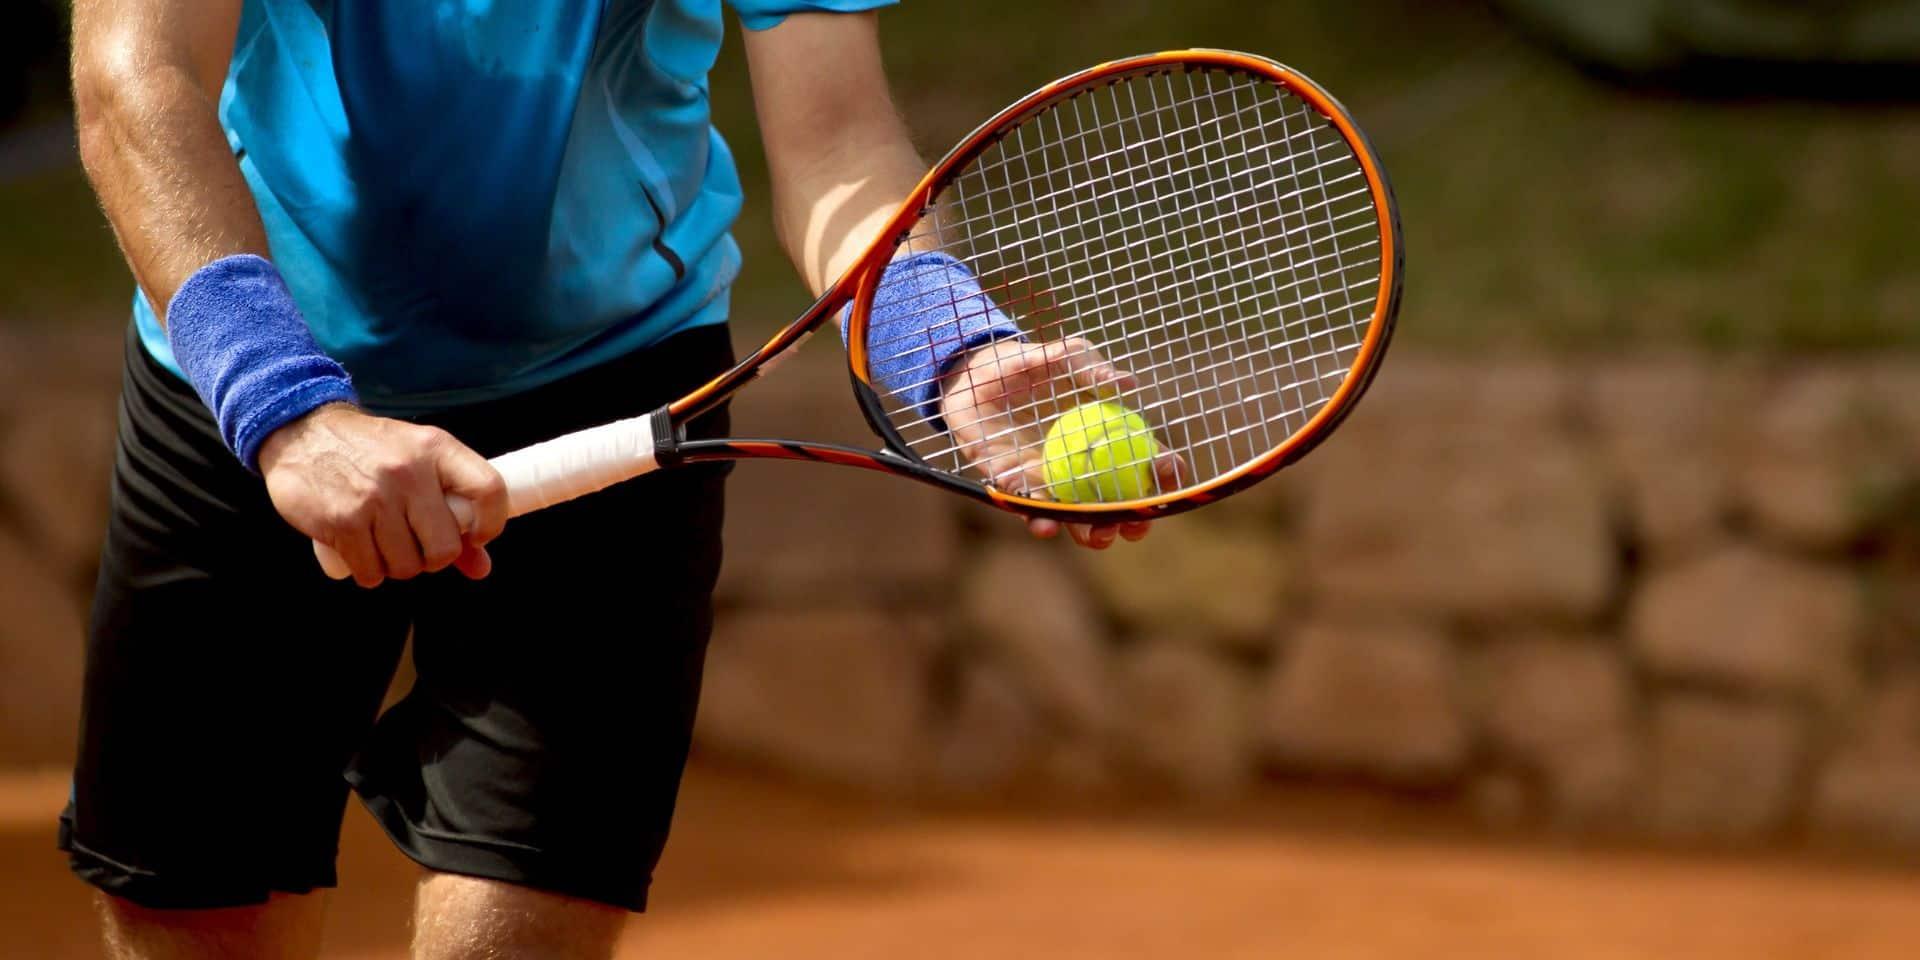 Matteo Berrettini remporte l'Ultimate Tennis Showdown en battant Tsitsipas en finale